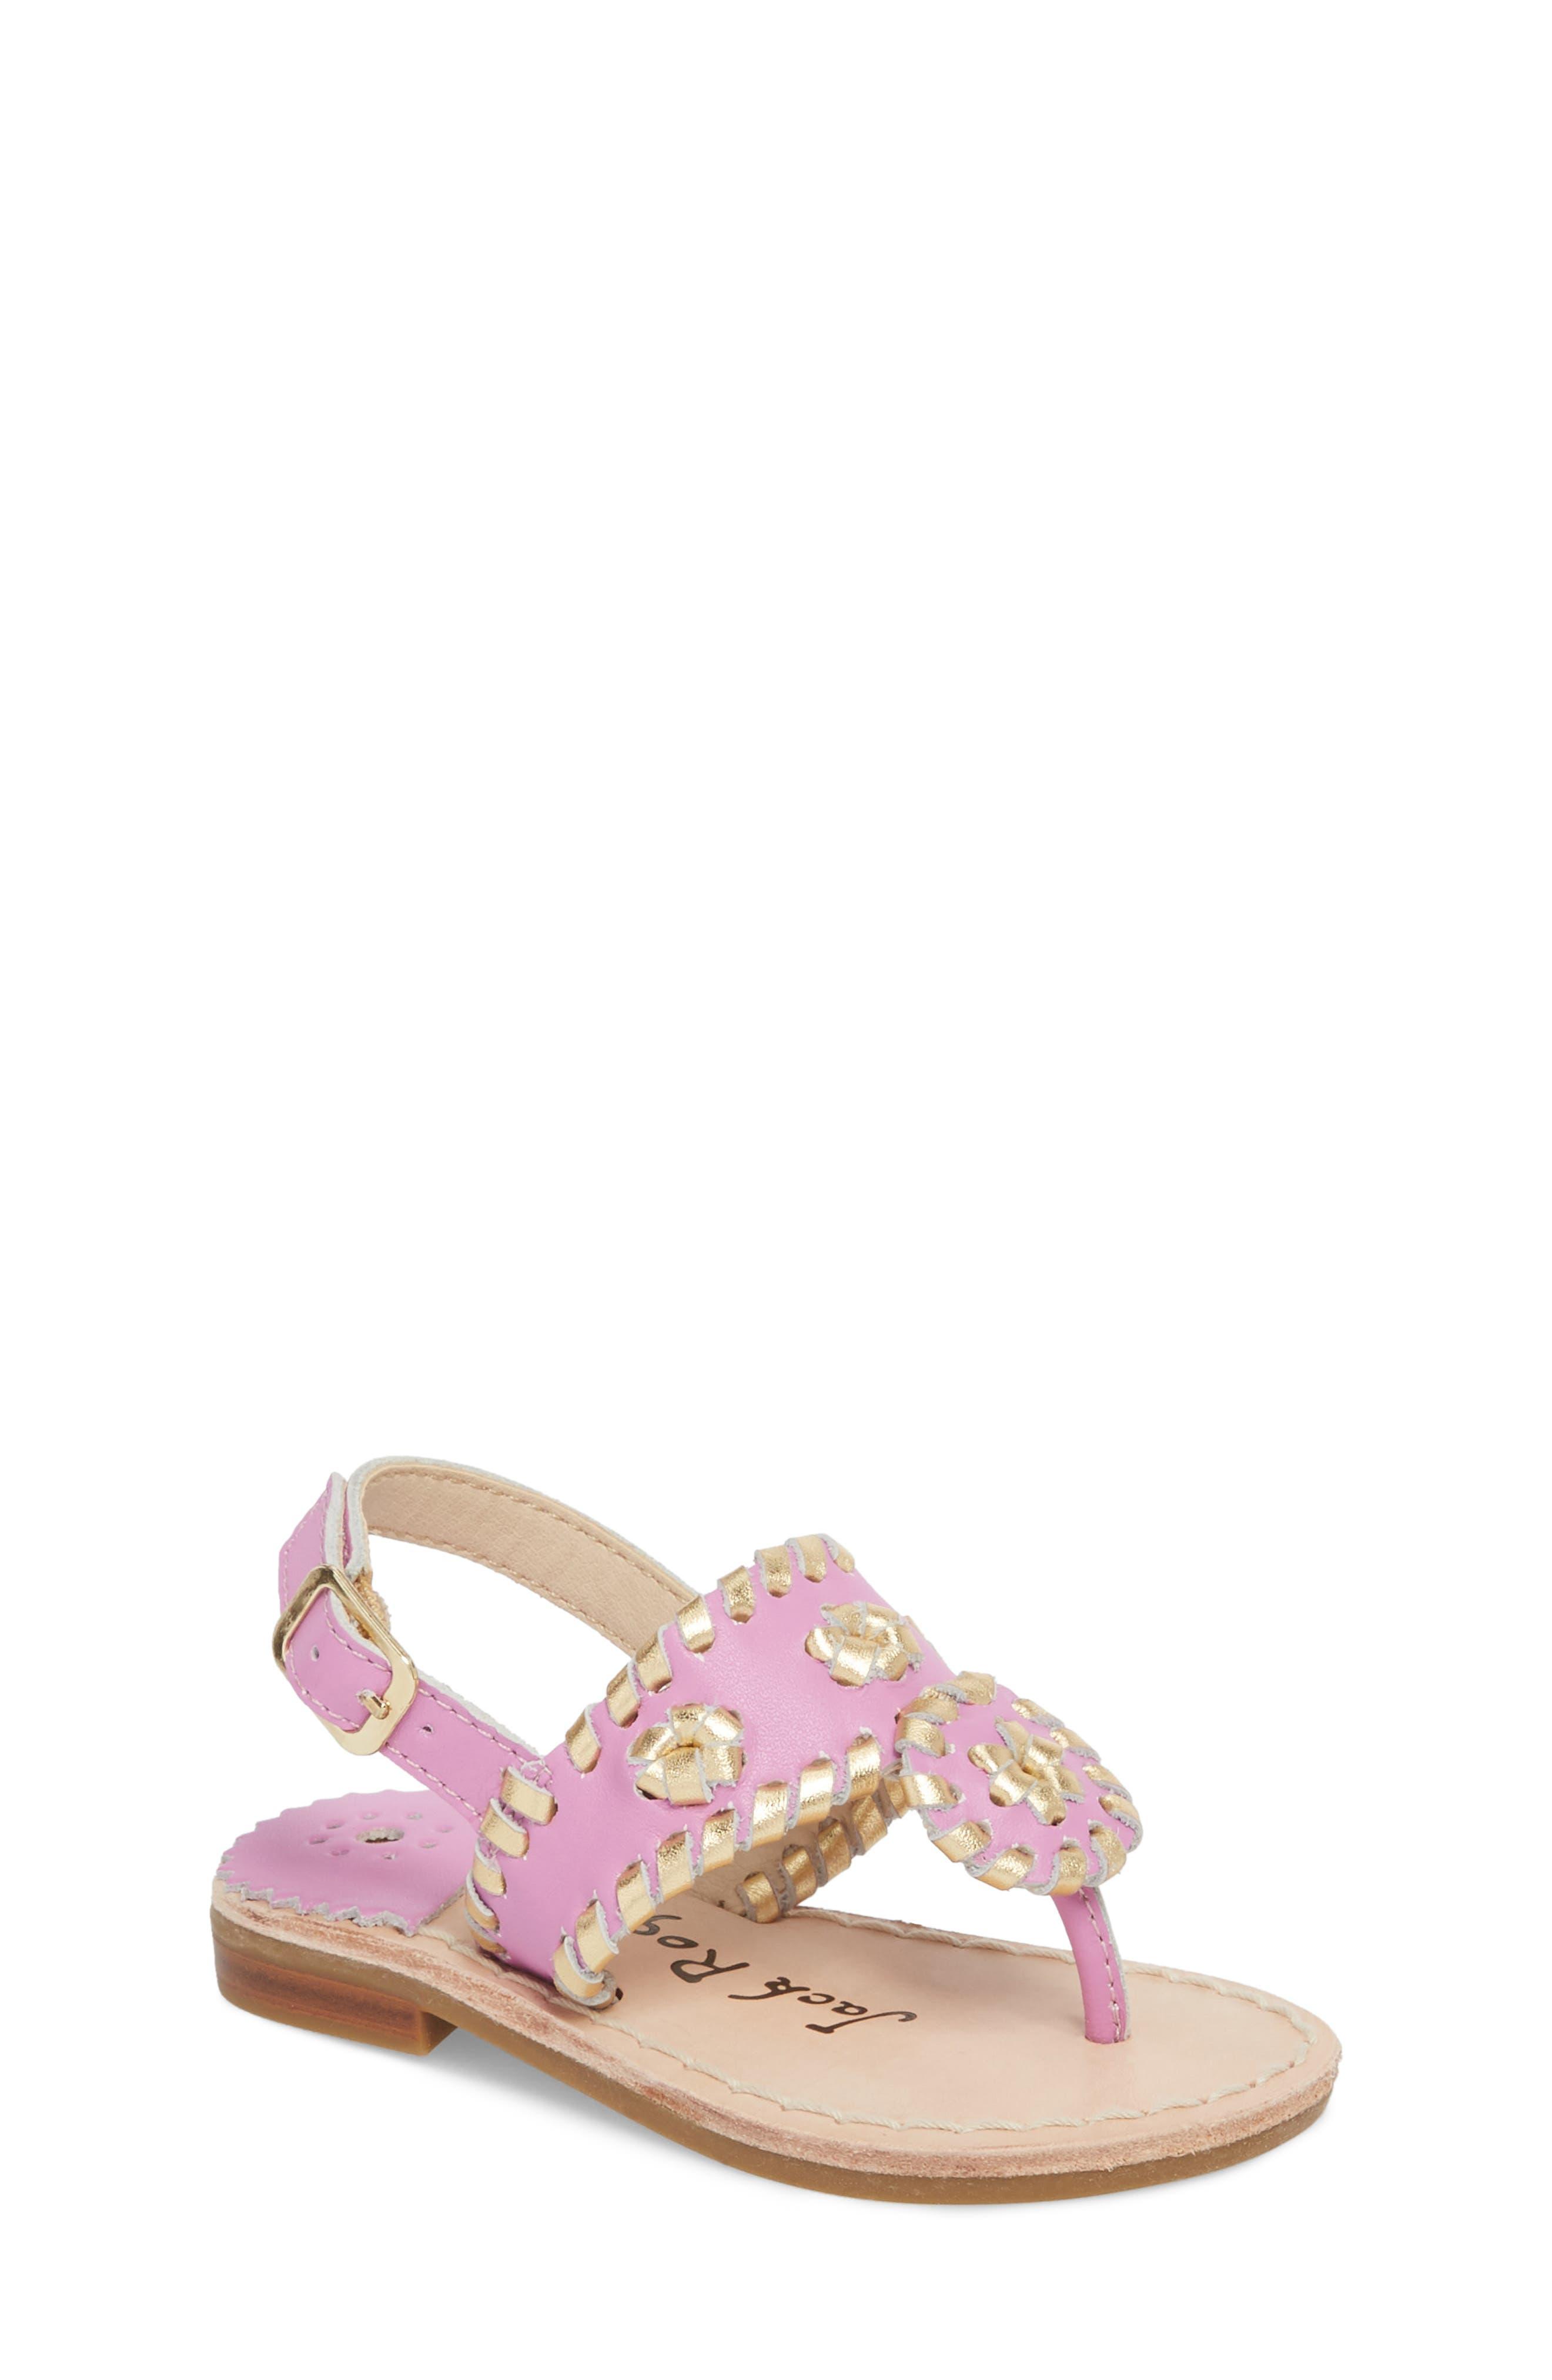 Little Miss Hollis Metallic Trim Sandal,                             Main thumbnail 1, color,                             Lavender Pink/ Gold Leather